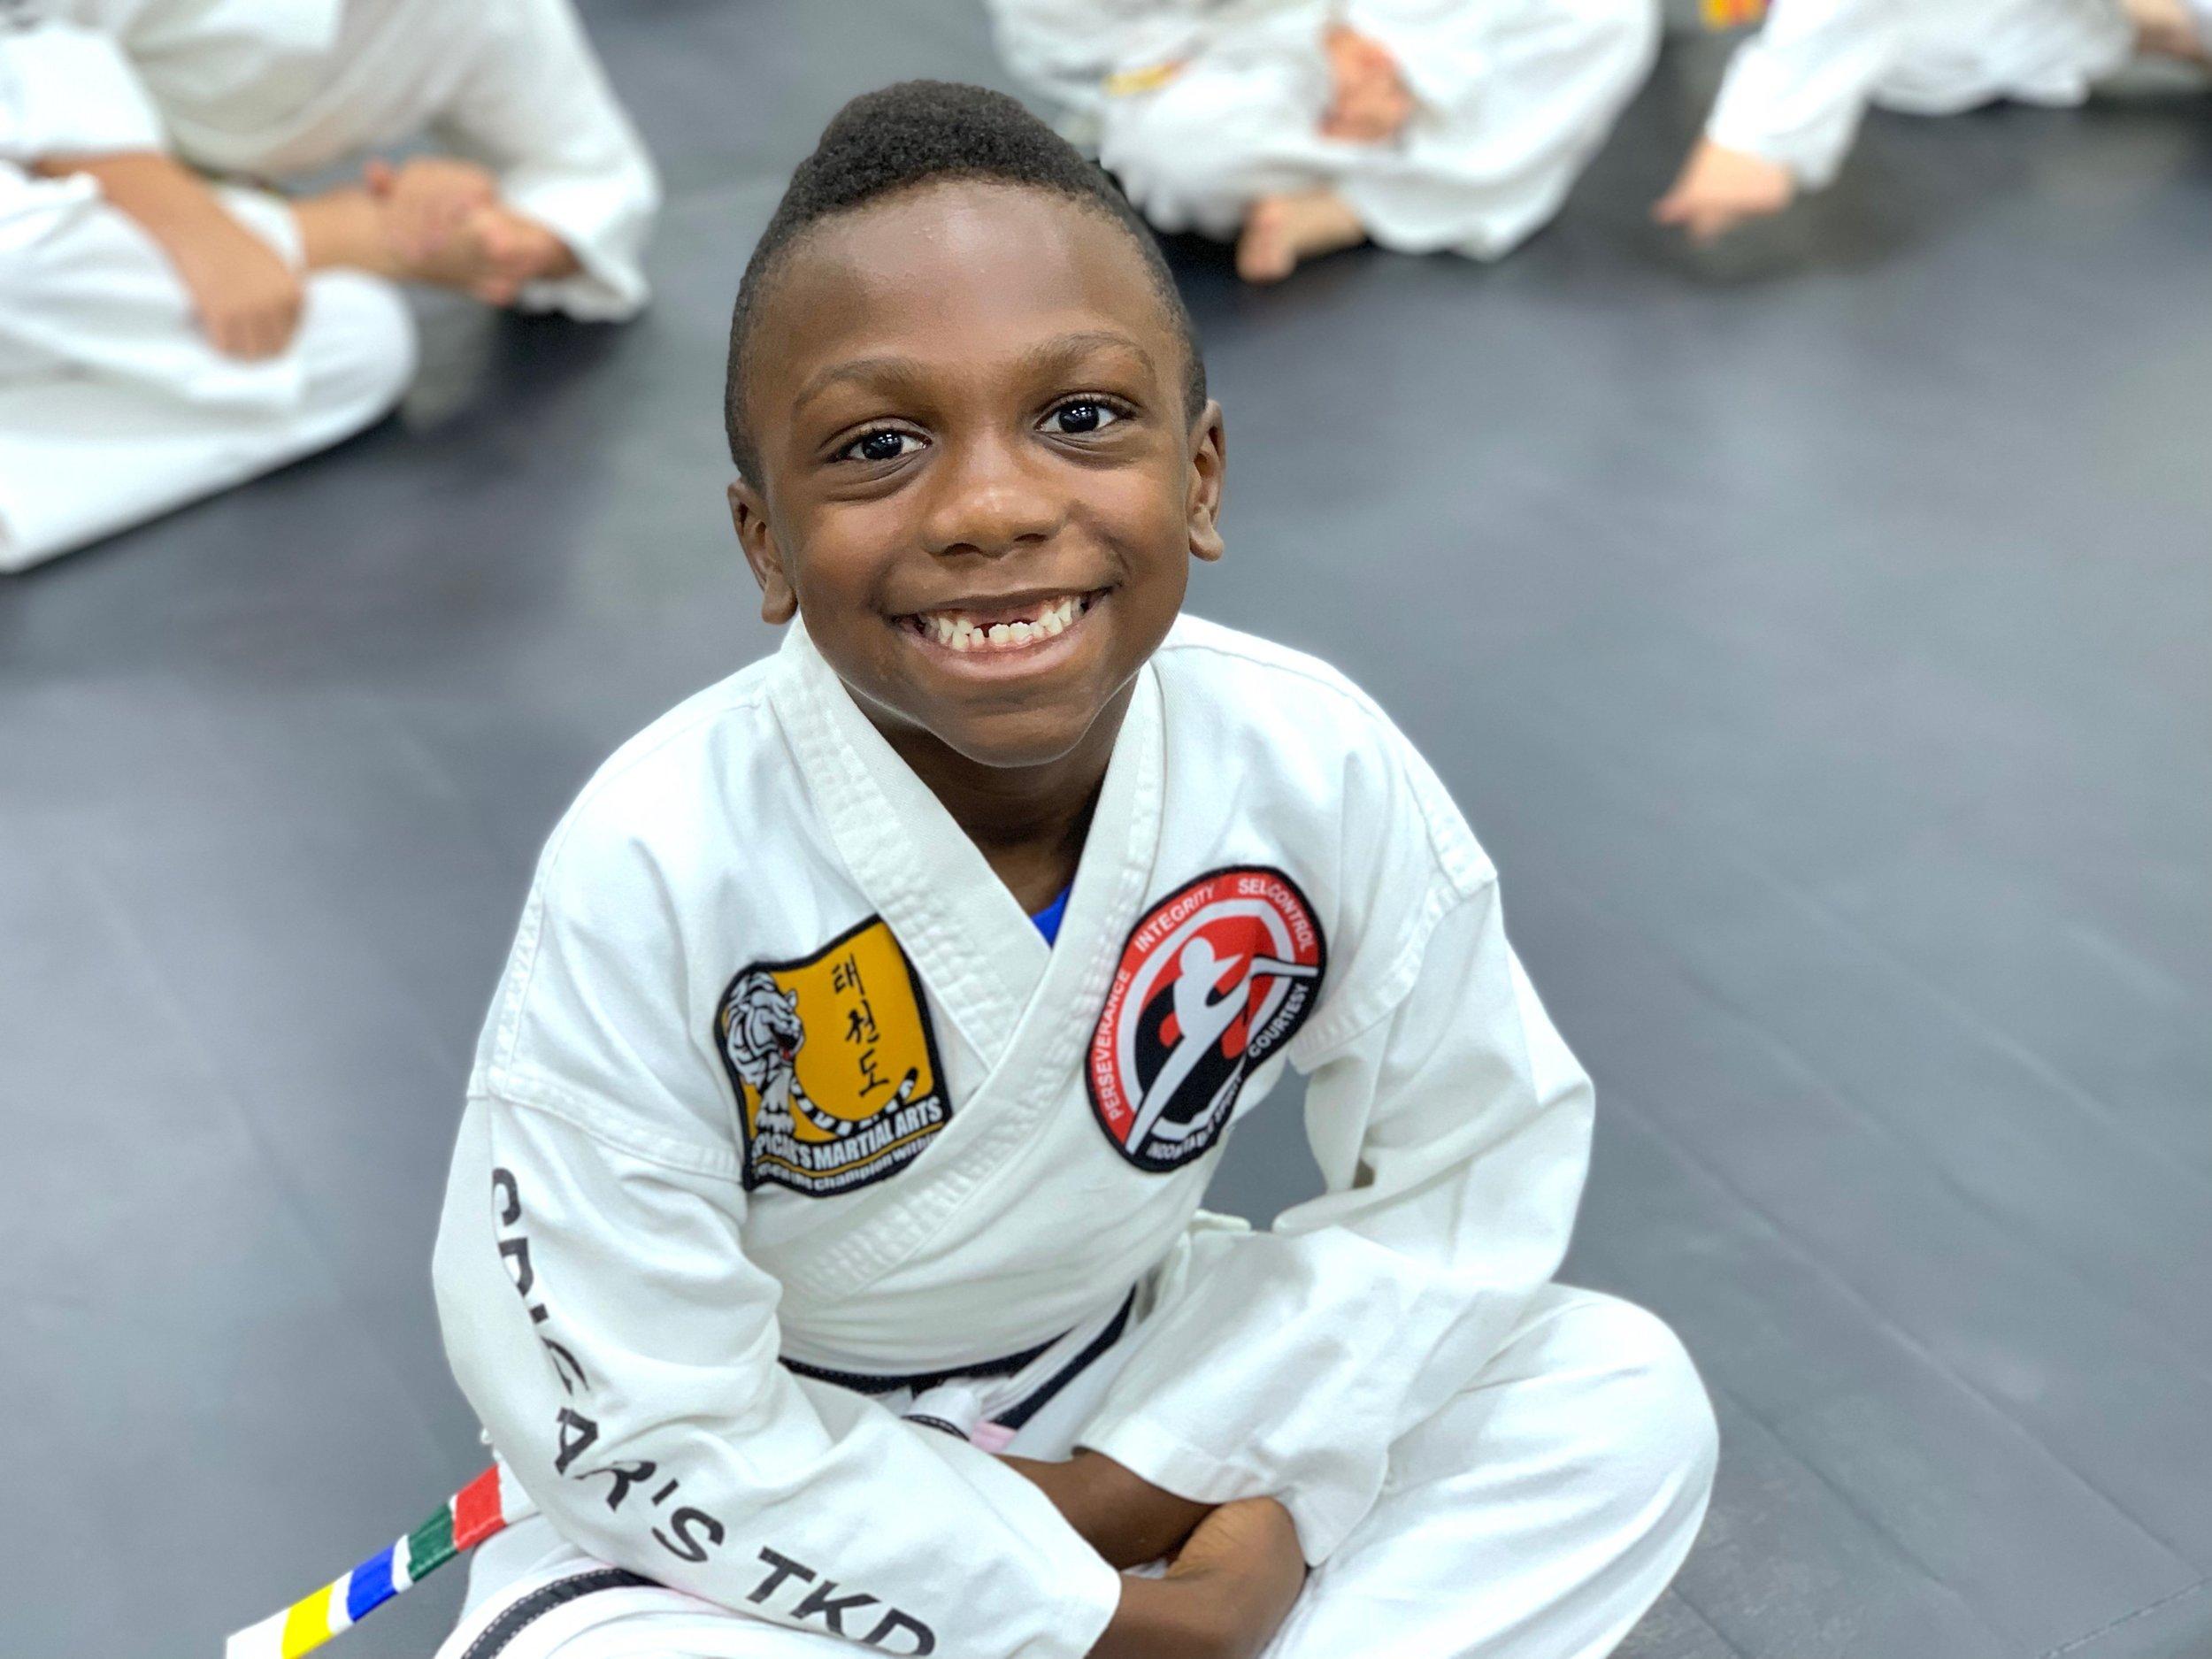 karate-kids-program-souhtlake-keller-grapevine-texas00055.jpeg